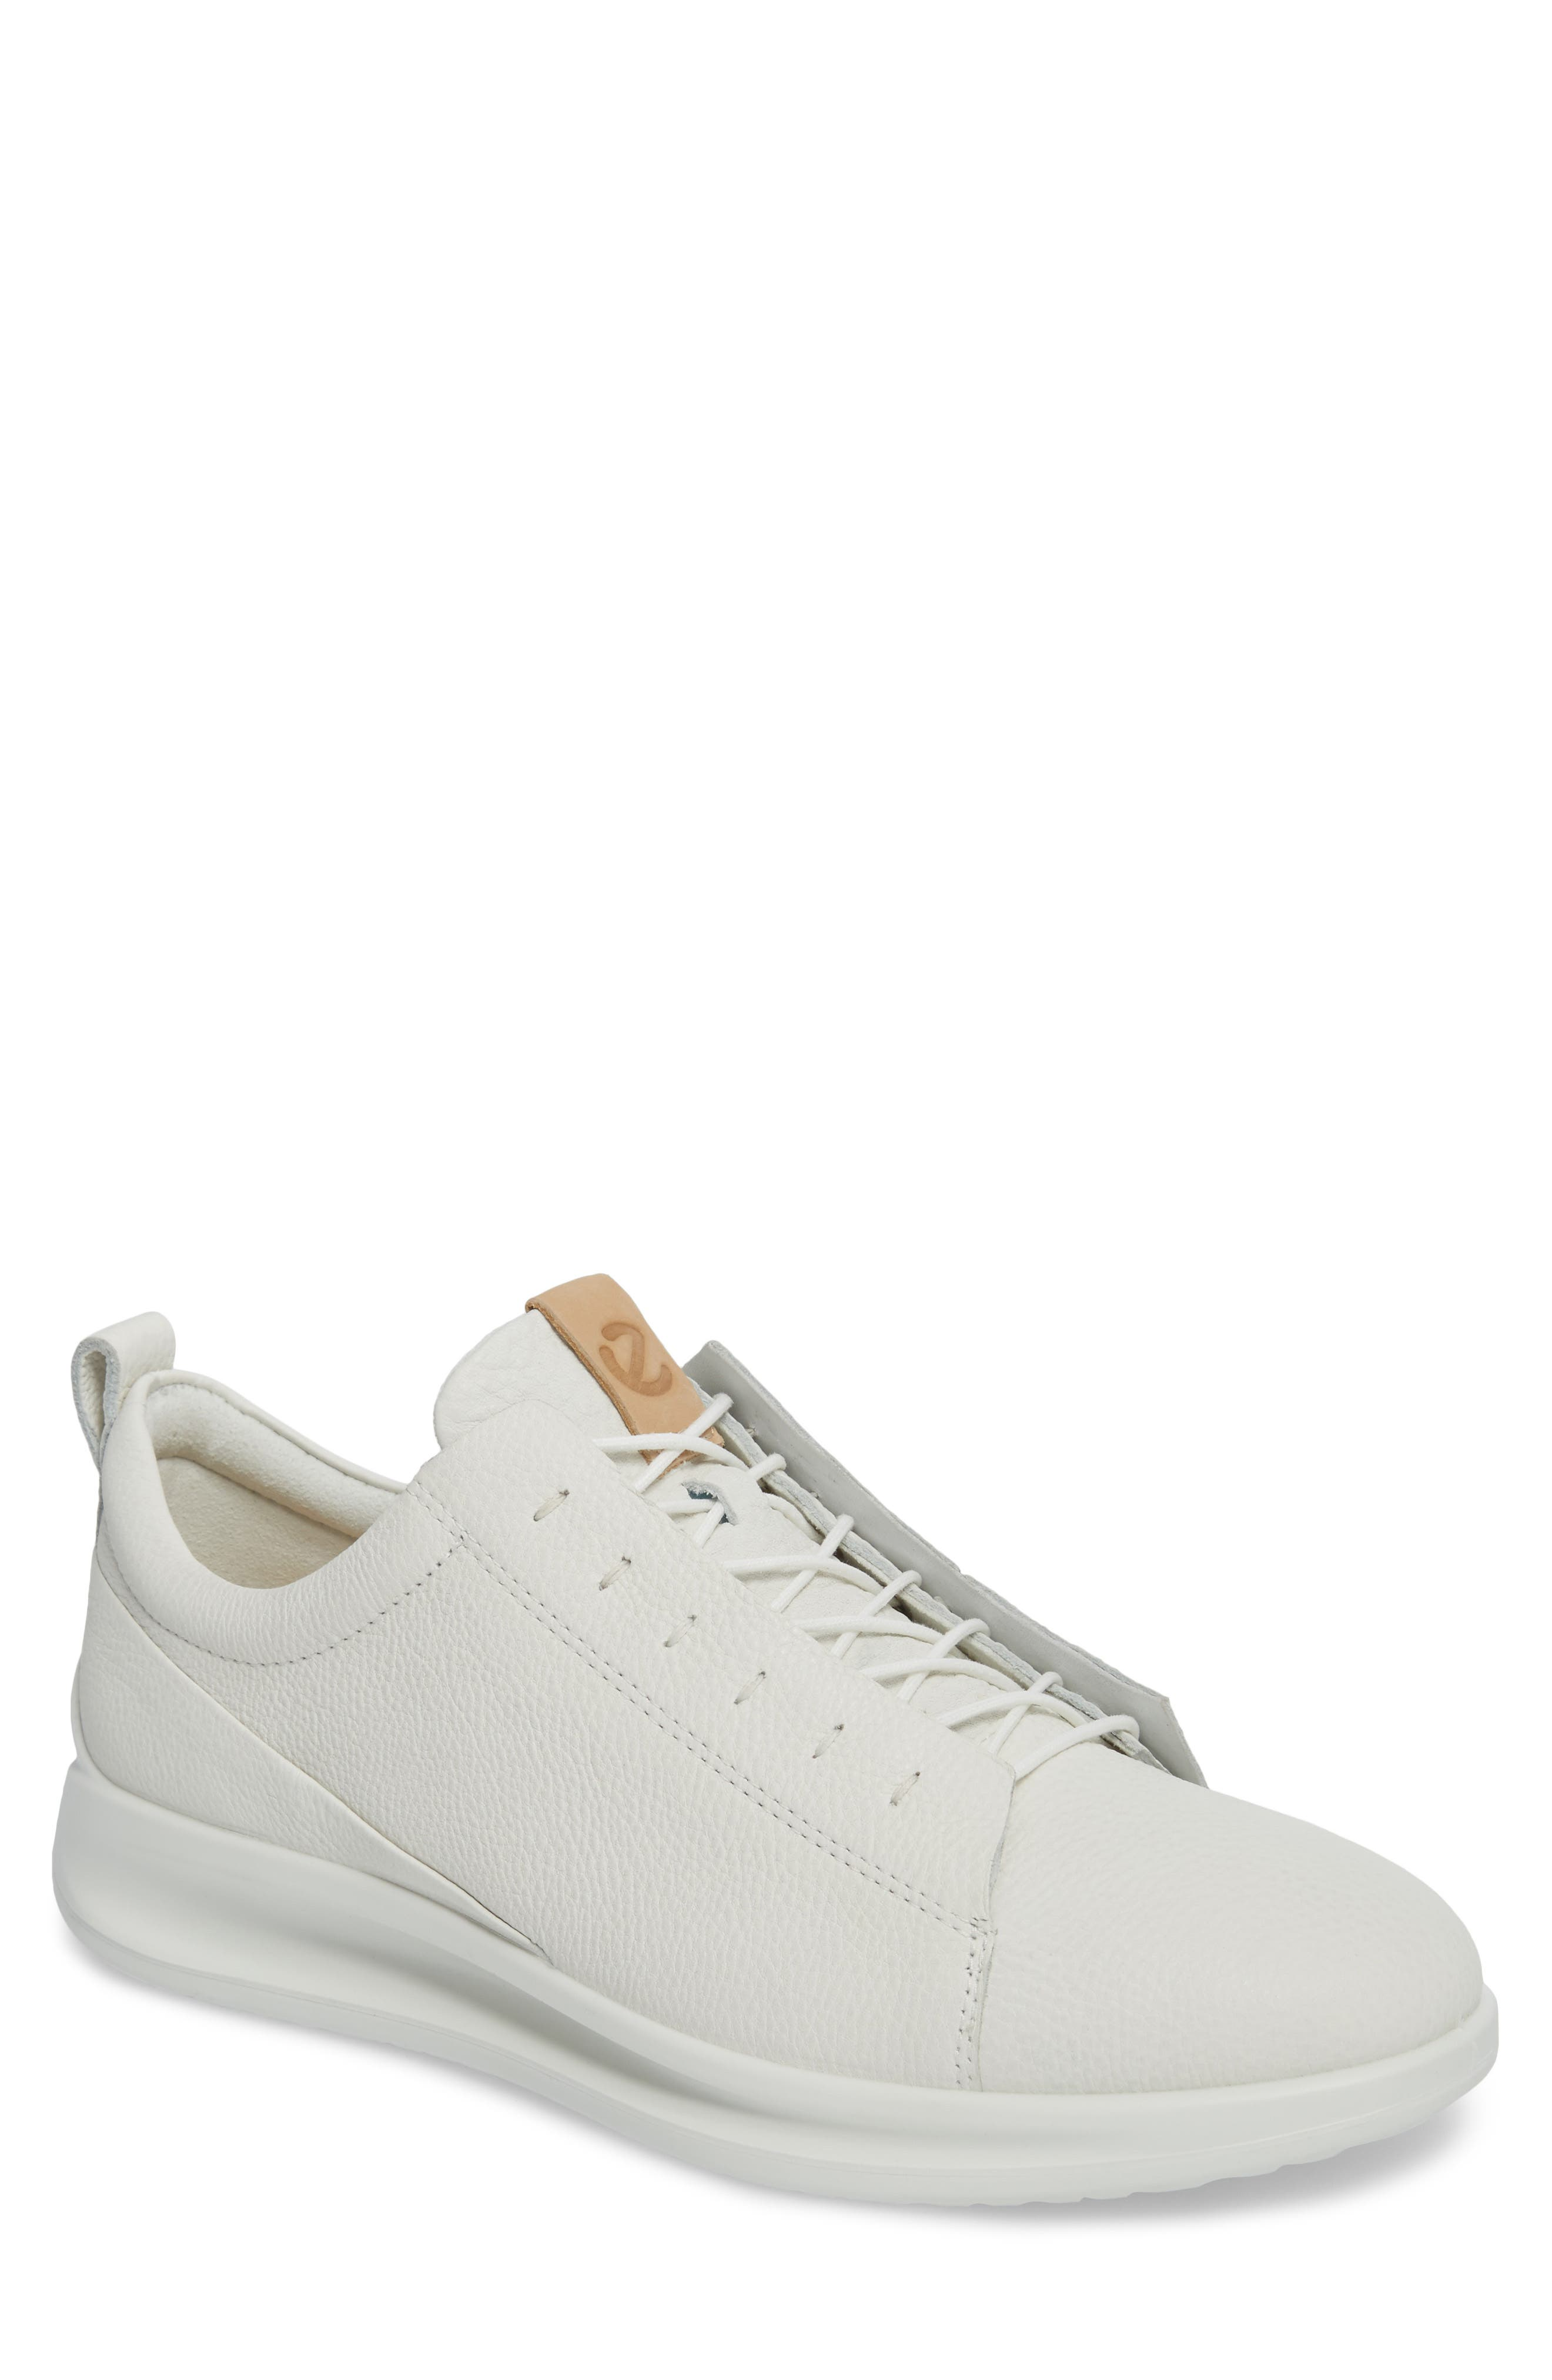 Aquet Low Top Sneaker,                         Main,                         color, White Leather